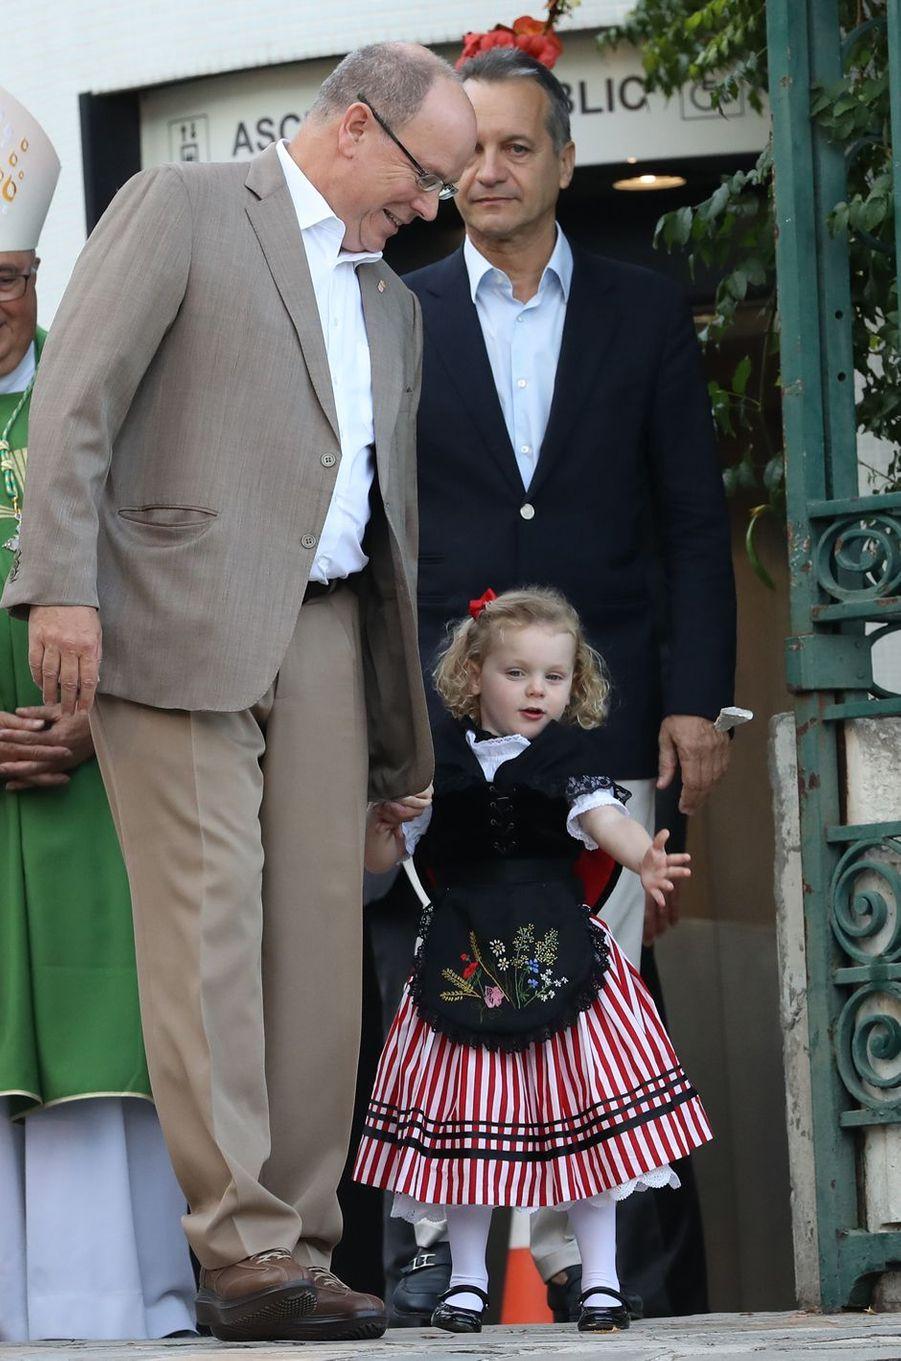 La princesse Gabriella avec le prince Albert II de Monaco, à Monaco le 31 août 2018